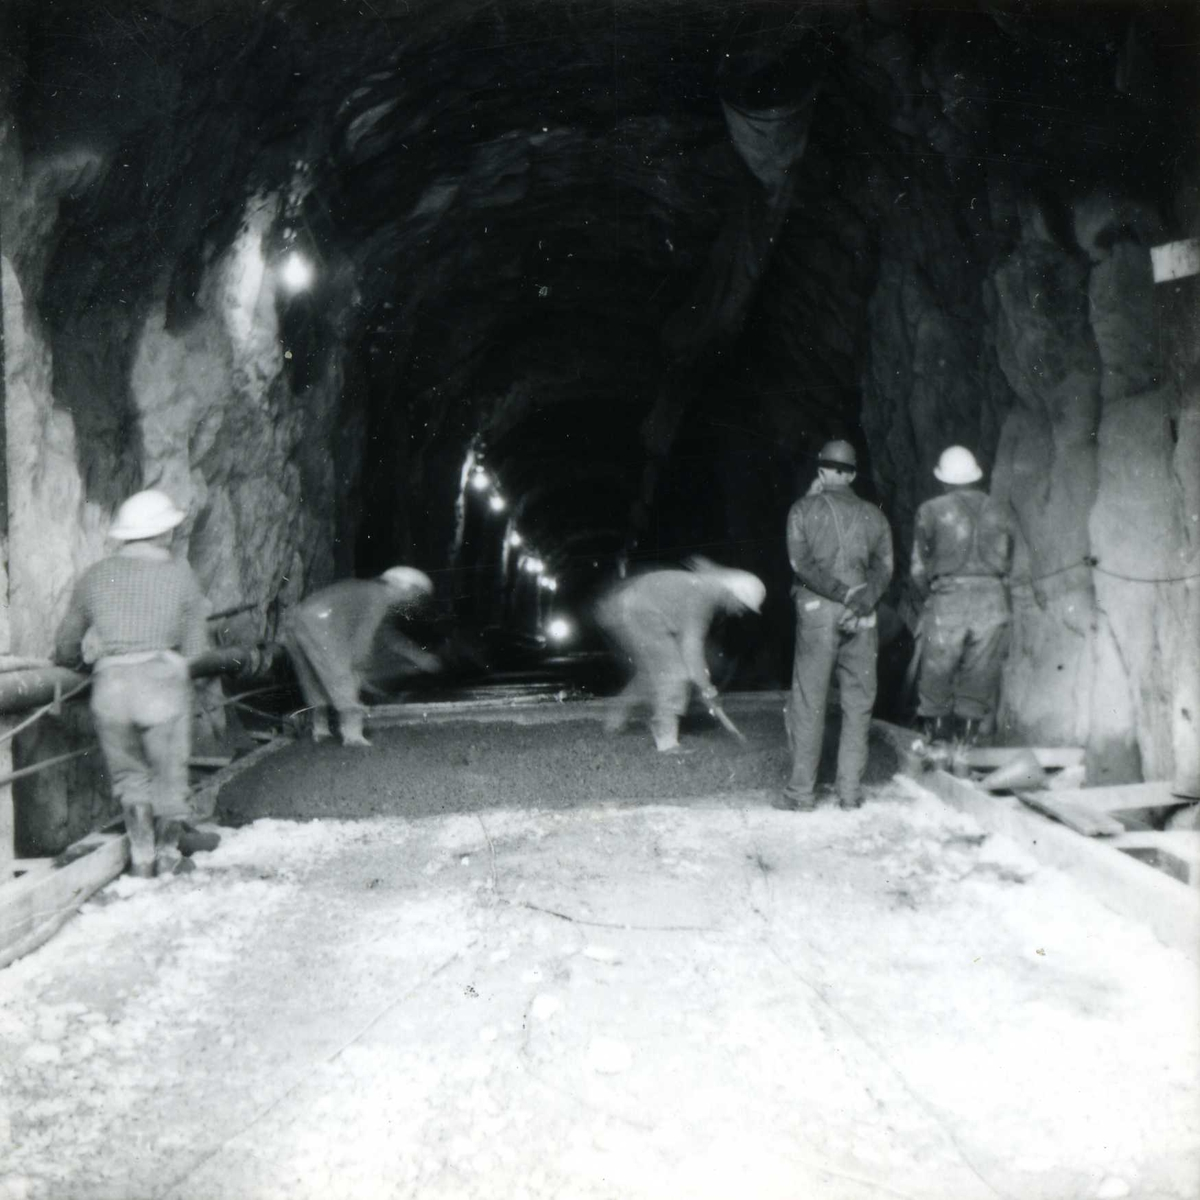 15.9.69  A-tunnell Byrte     221